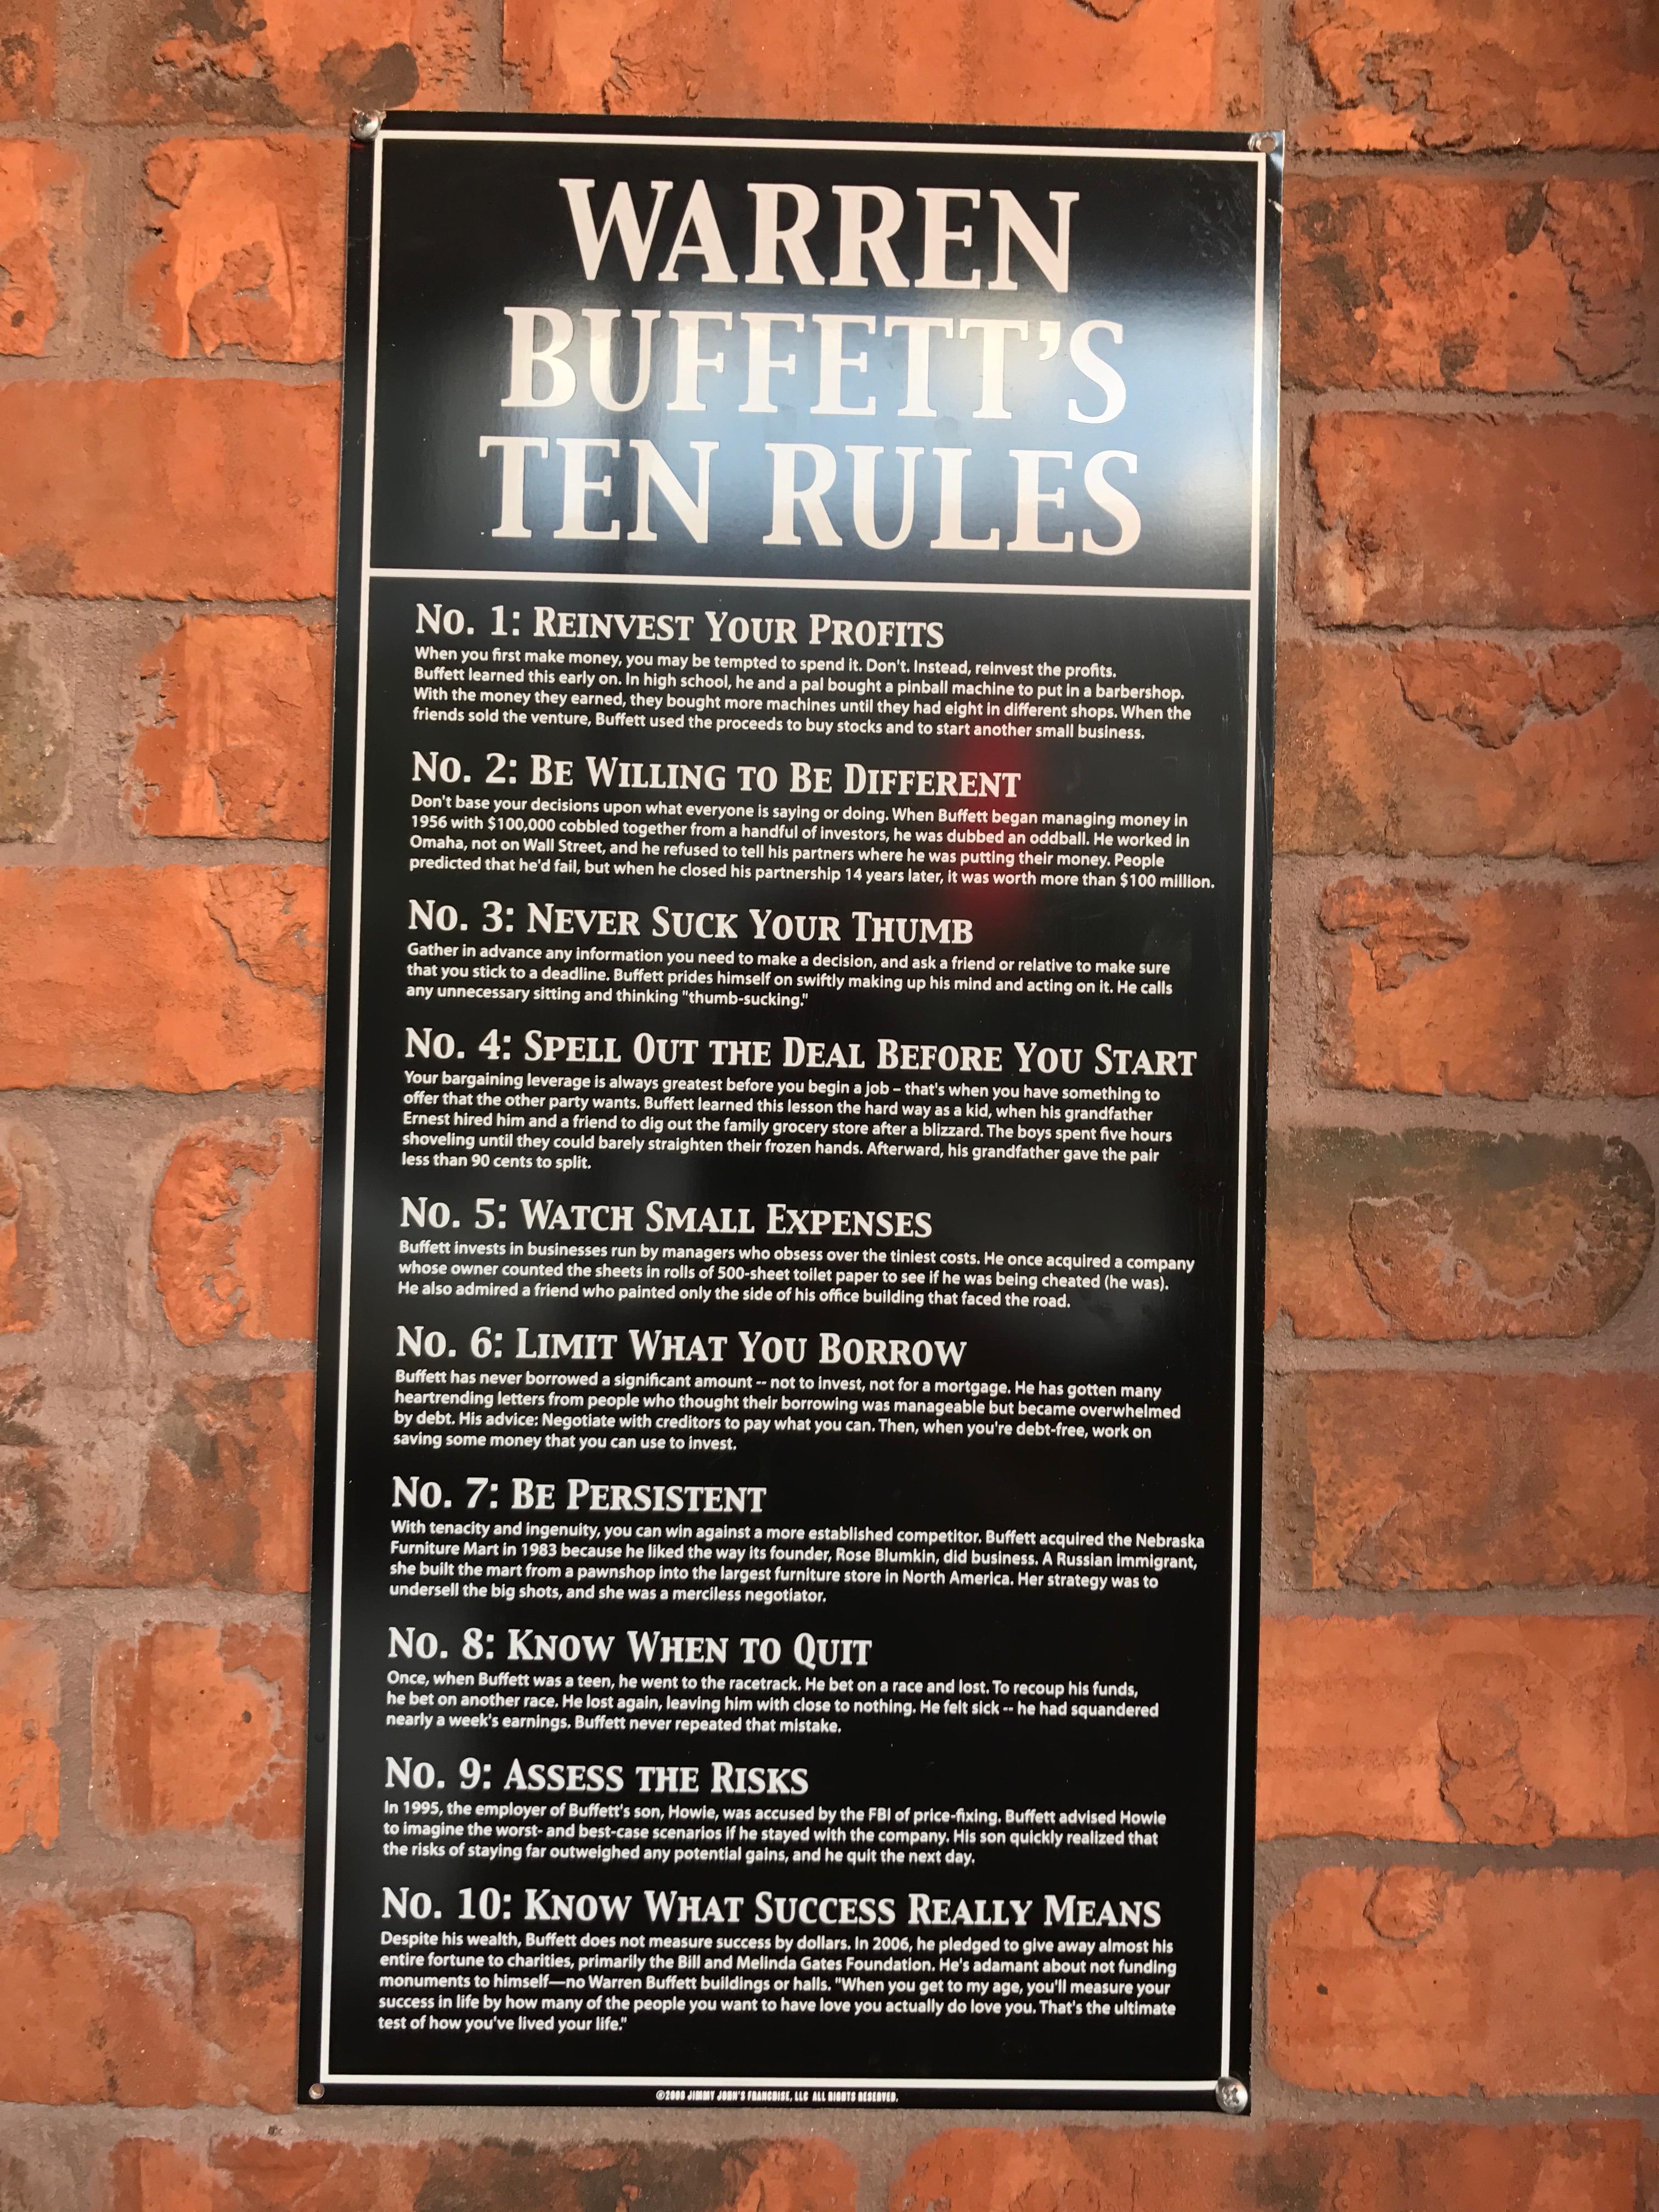 Warren Buffett's Ten Rules - Jimmy John's - Vintage Value Investing